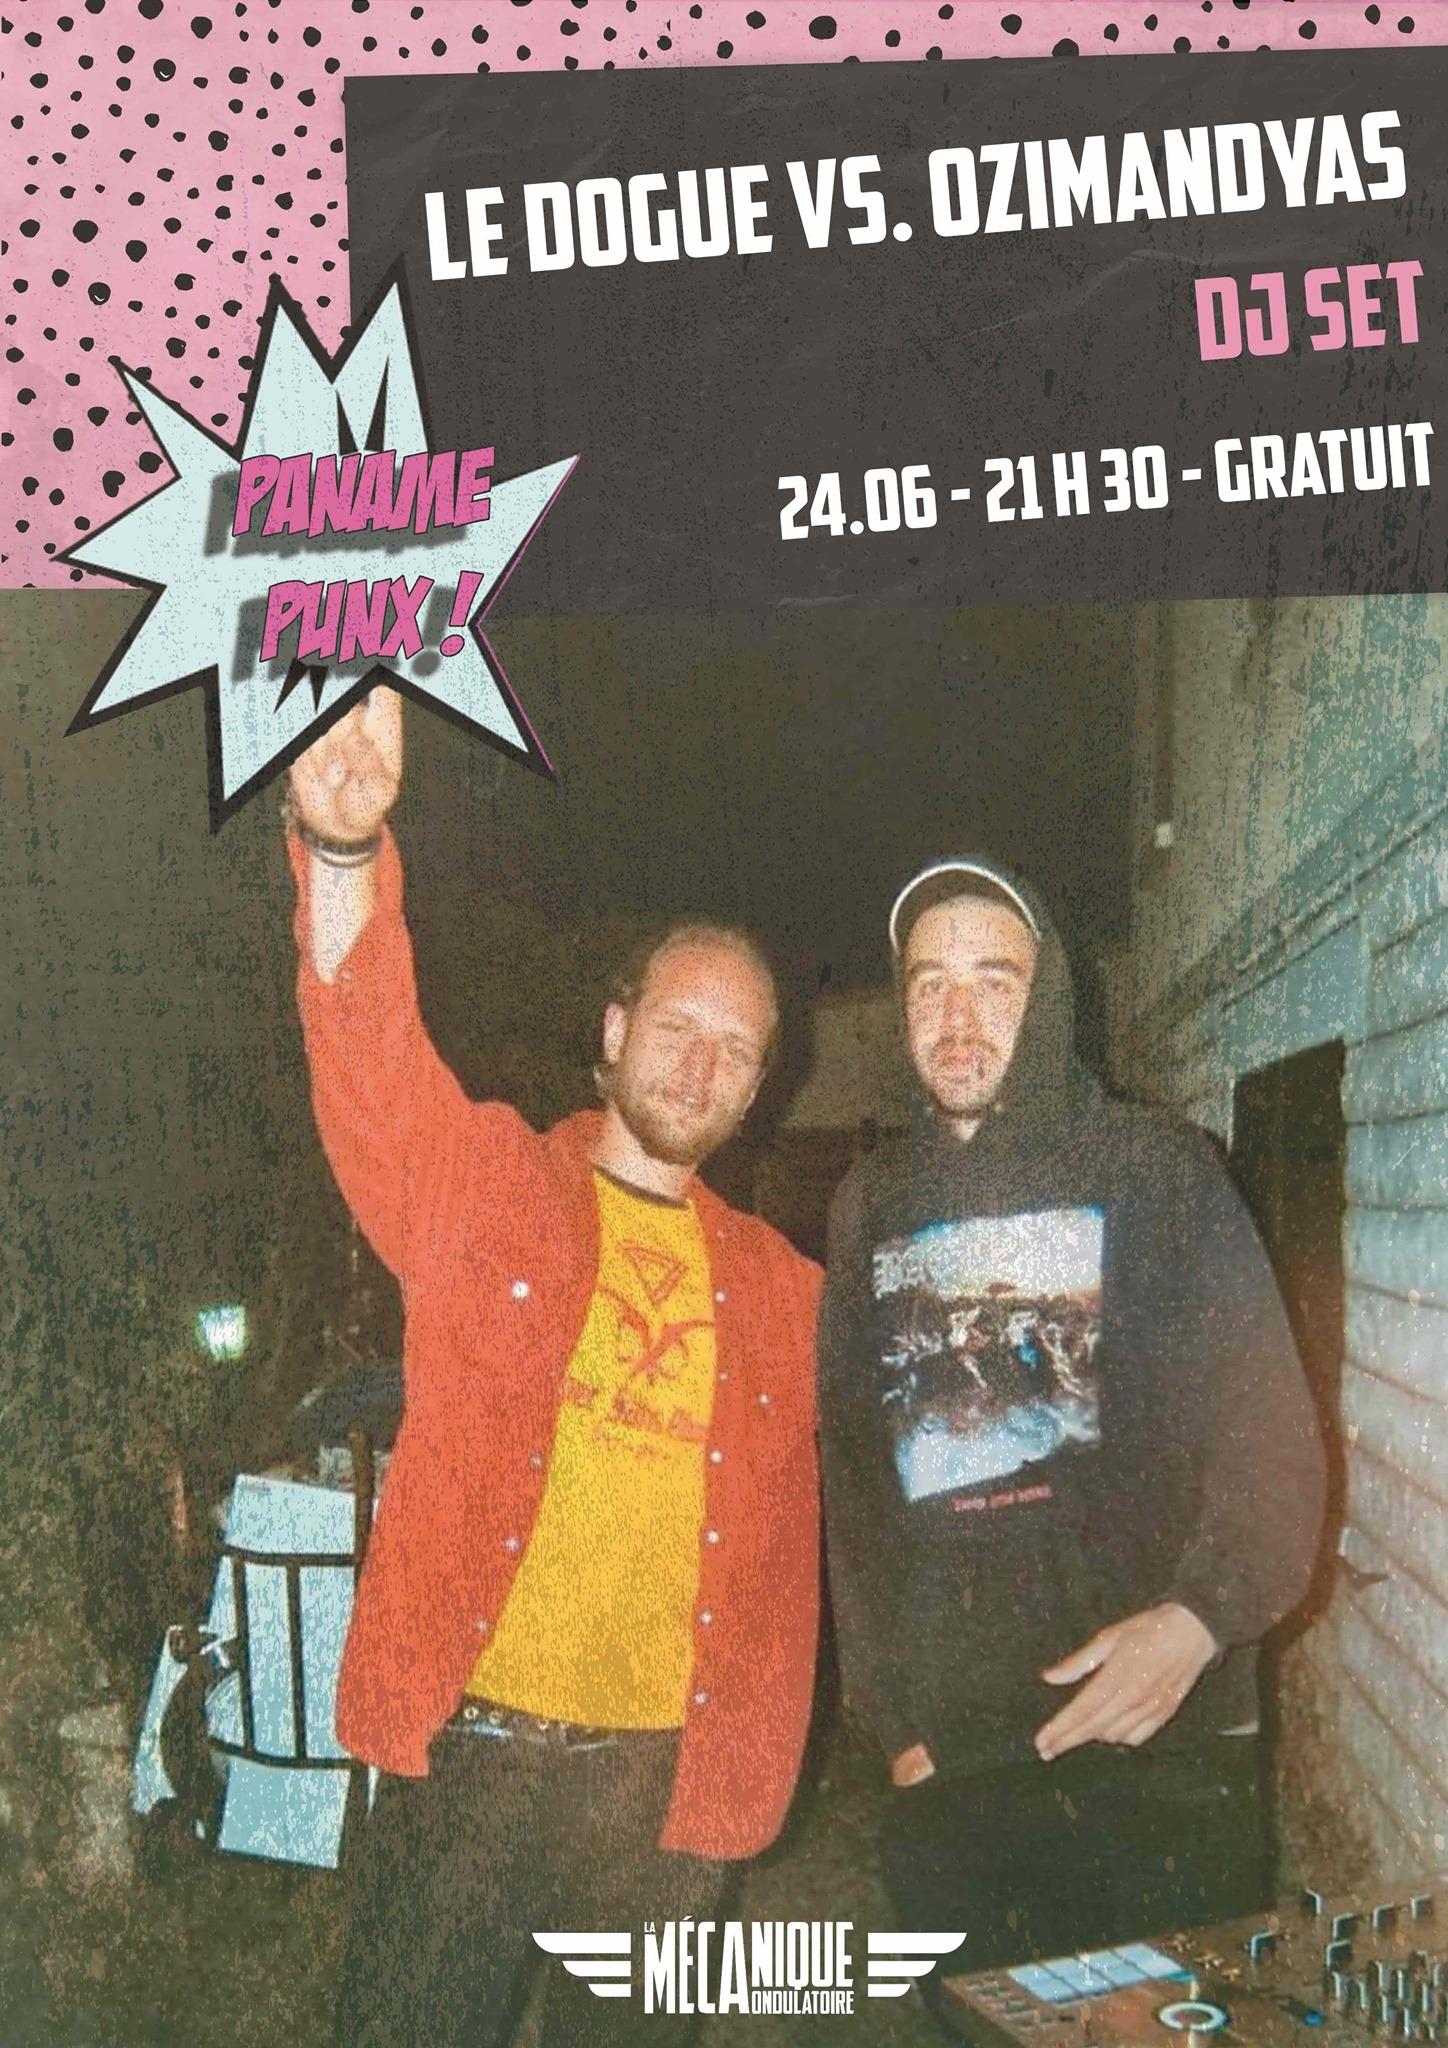 PP : LE DOGUE VS OZIMANDYAS // 23.06